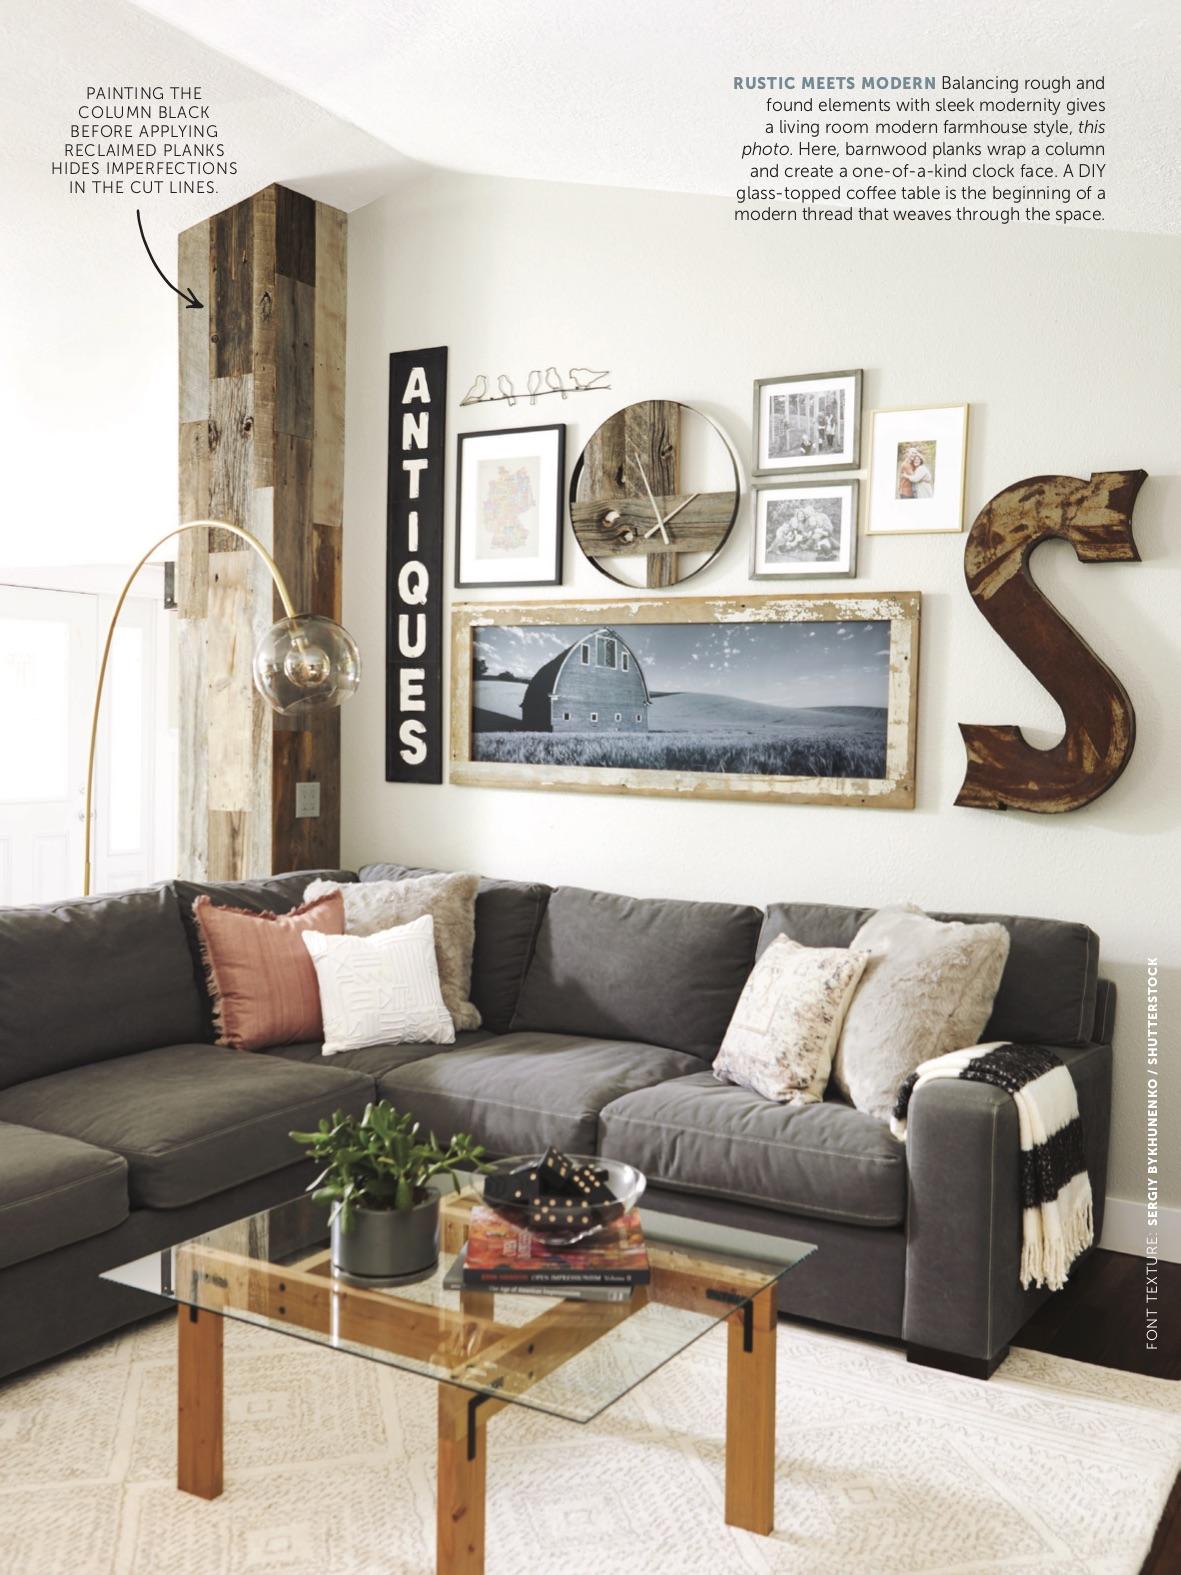 080-087 DIY1619 Mod Farmhouse Schmidt Living Room1.jpg